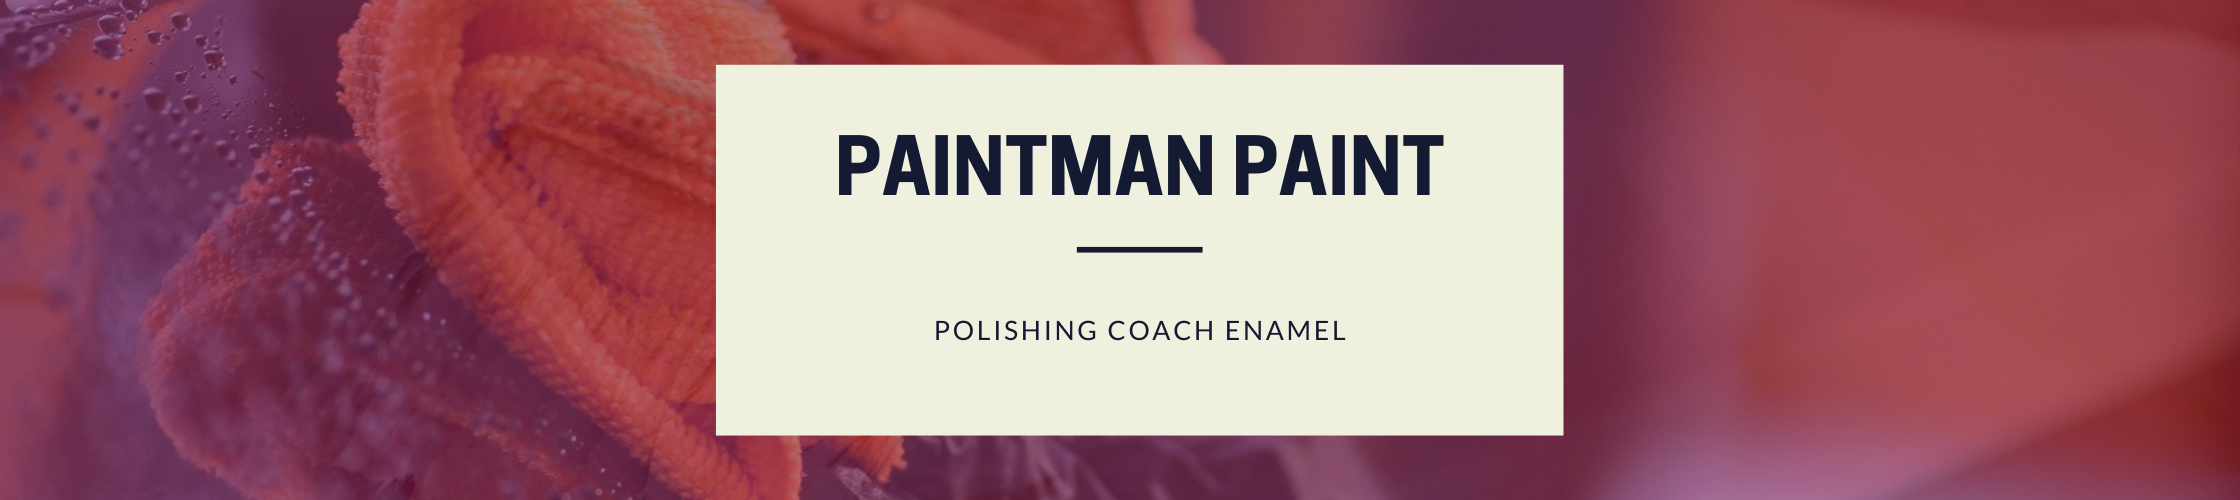 POLISHING COACH ENAMEL